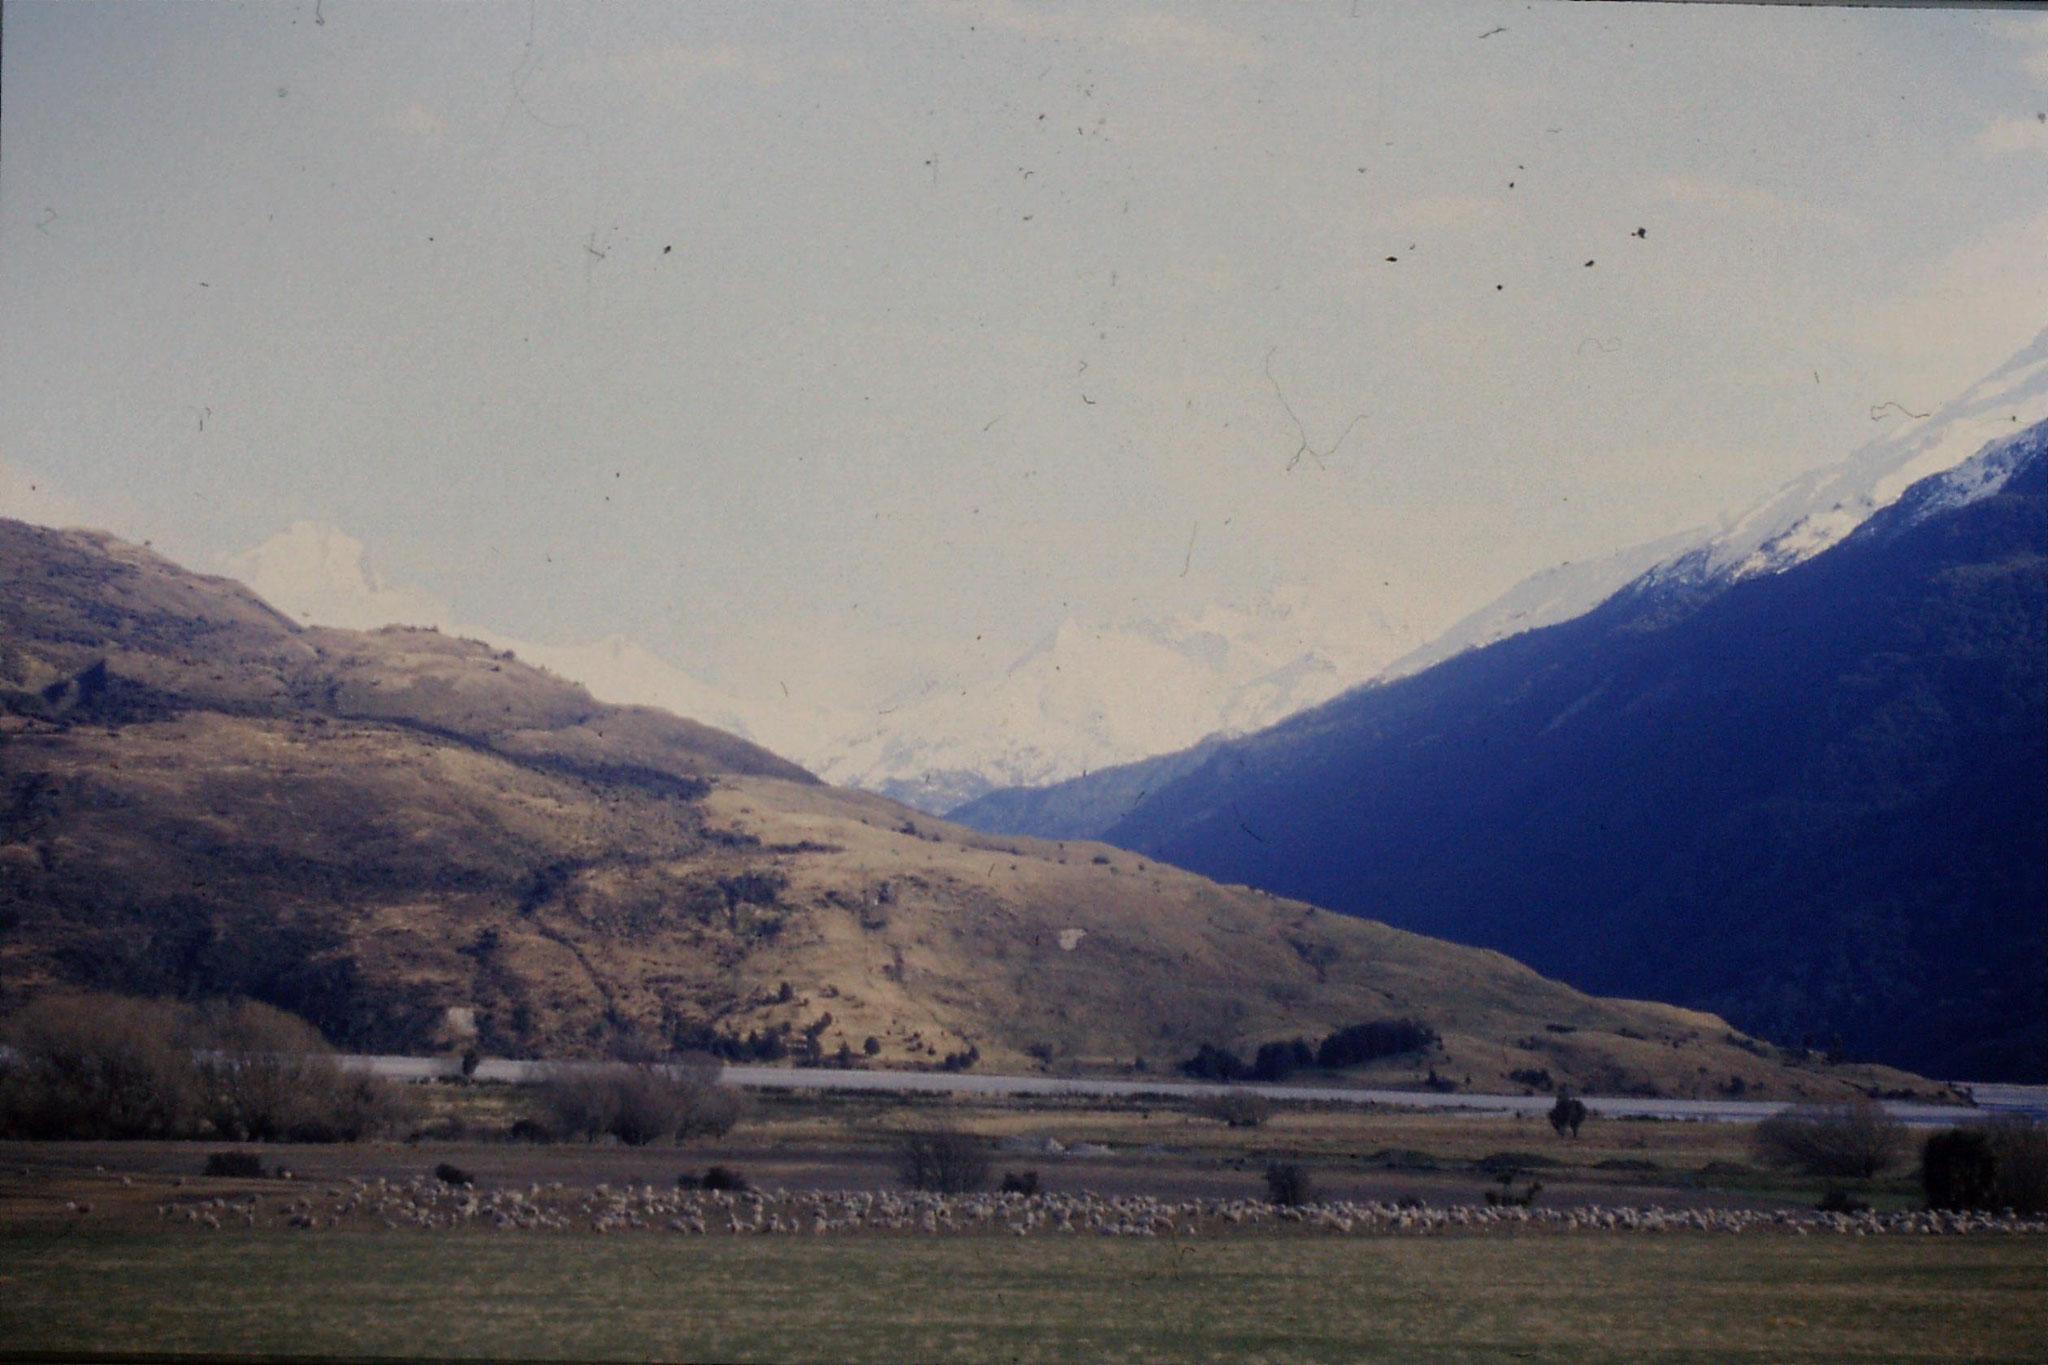 21/8/1990: 25: Wilkin Valley and Oblong Peak